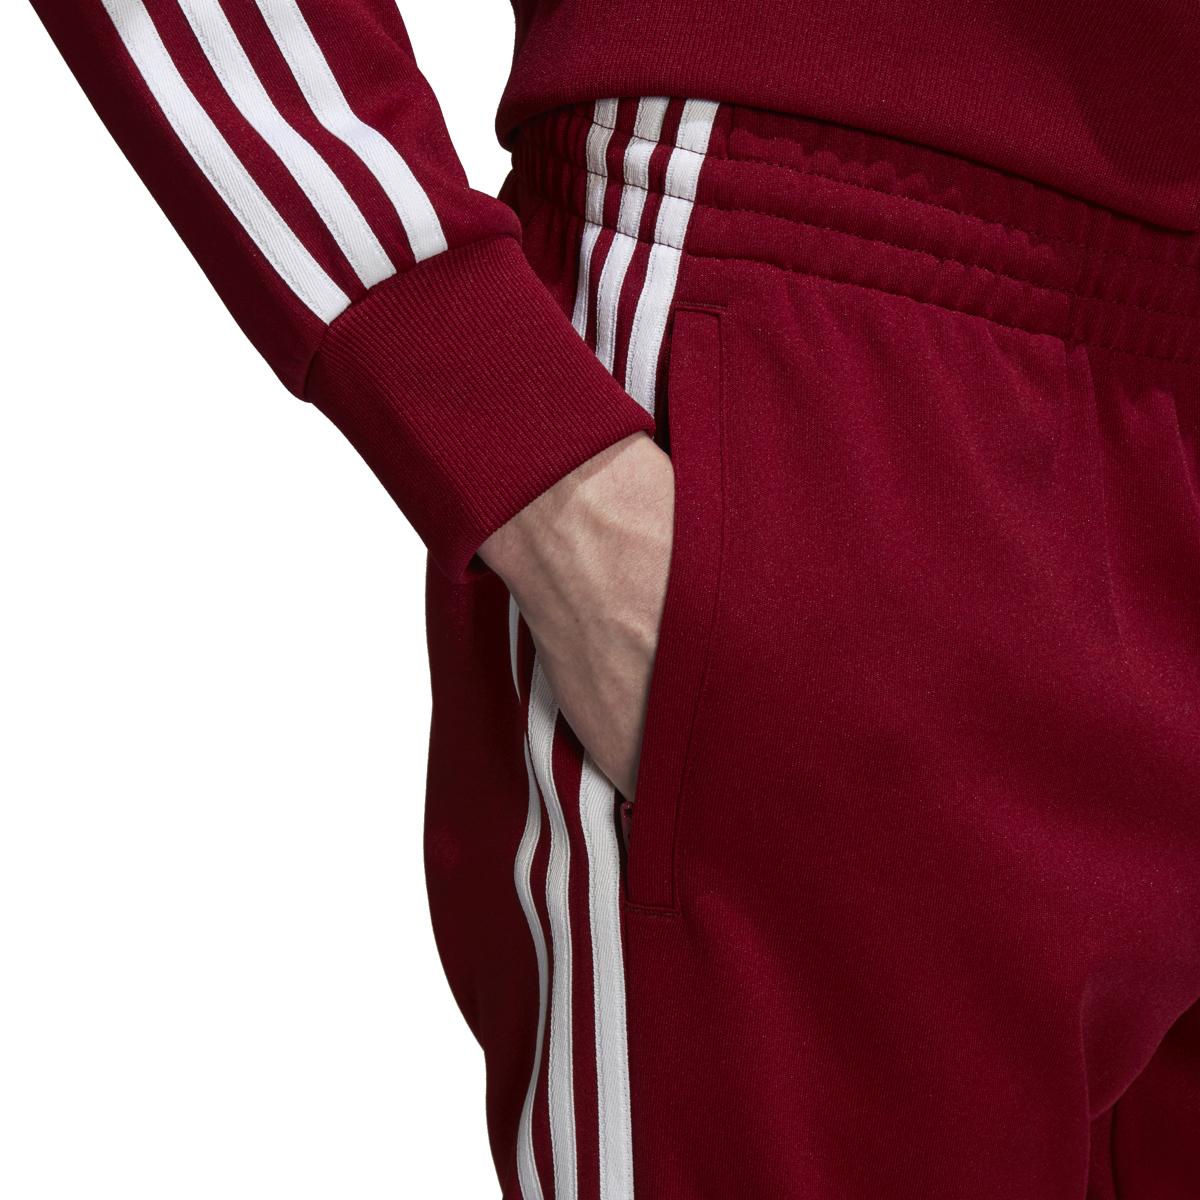 da9f86b64 Adidas Men's Originals SST Track Pants Collegiate Burgundy DU1348   eBay